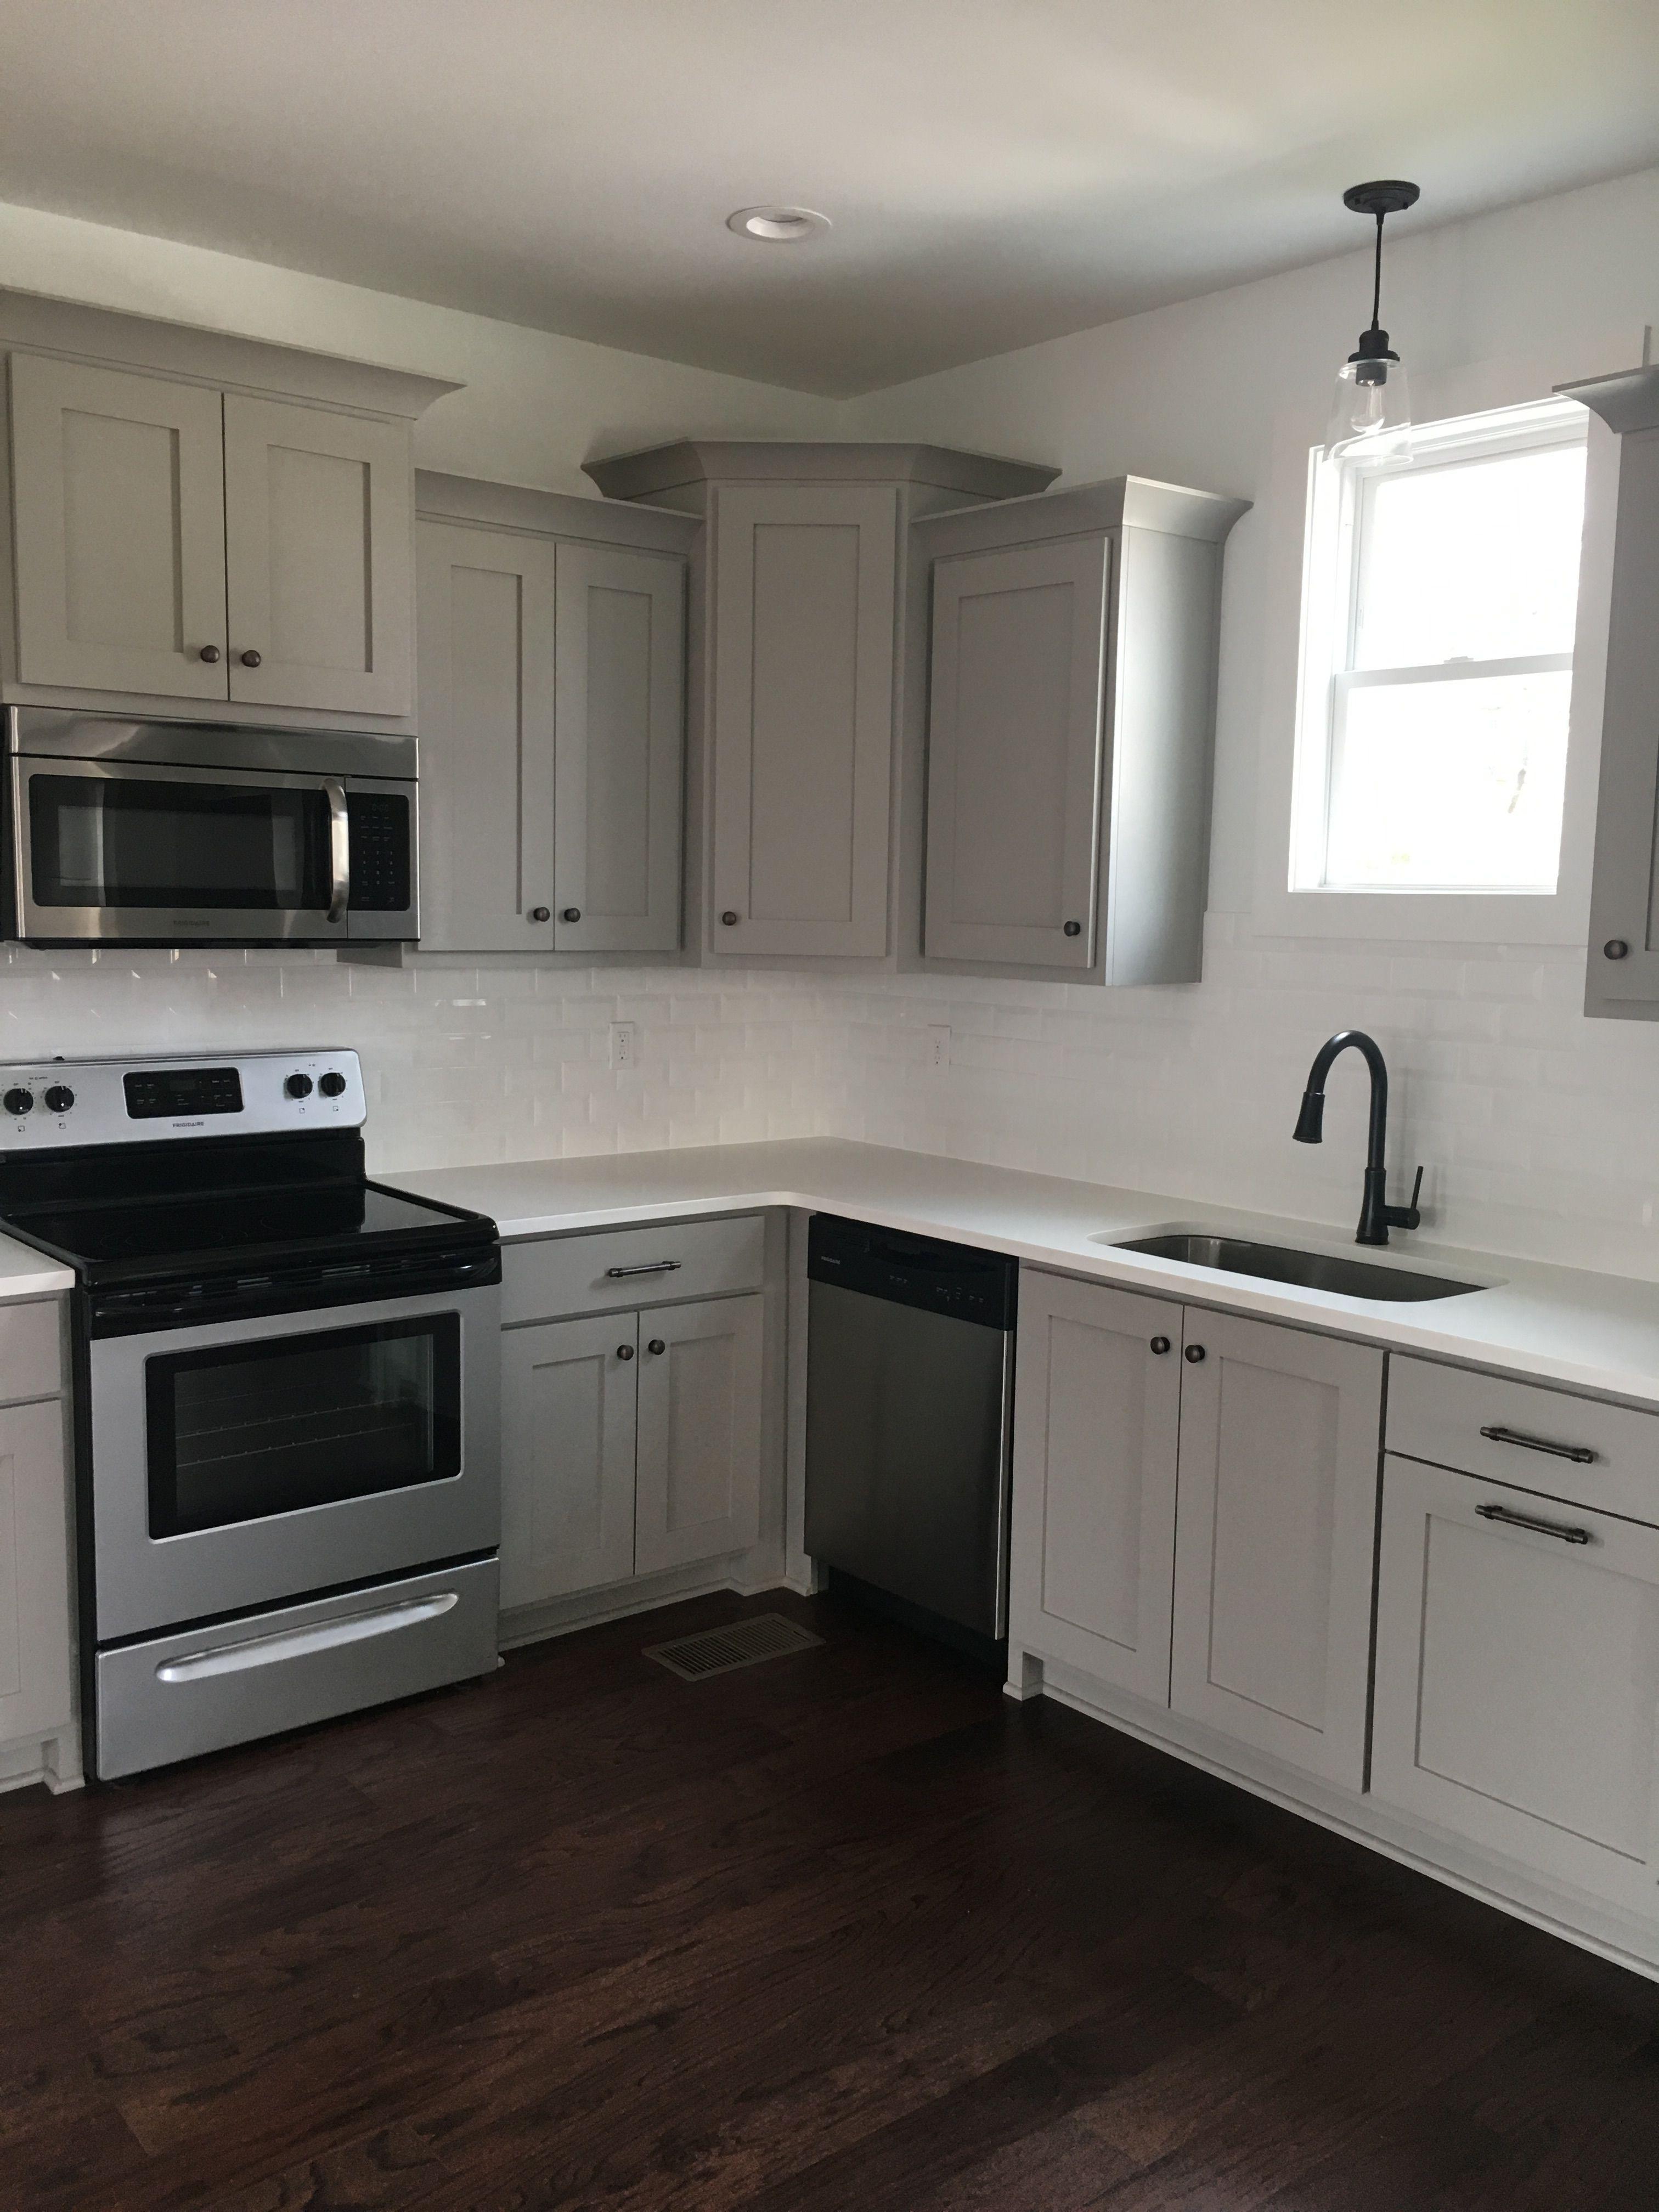 Gray kitchen cabinets white quarts countertops subway tile